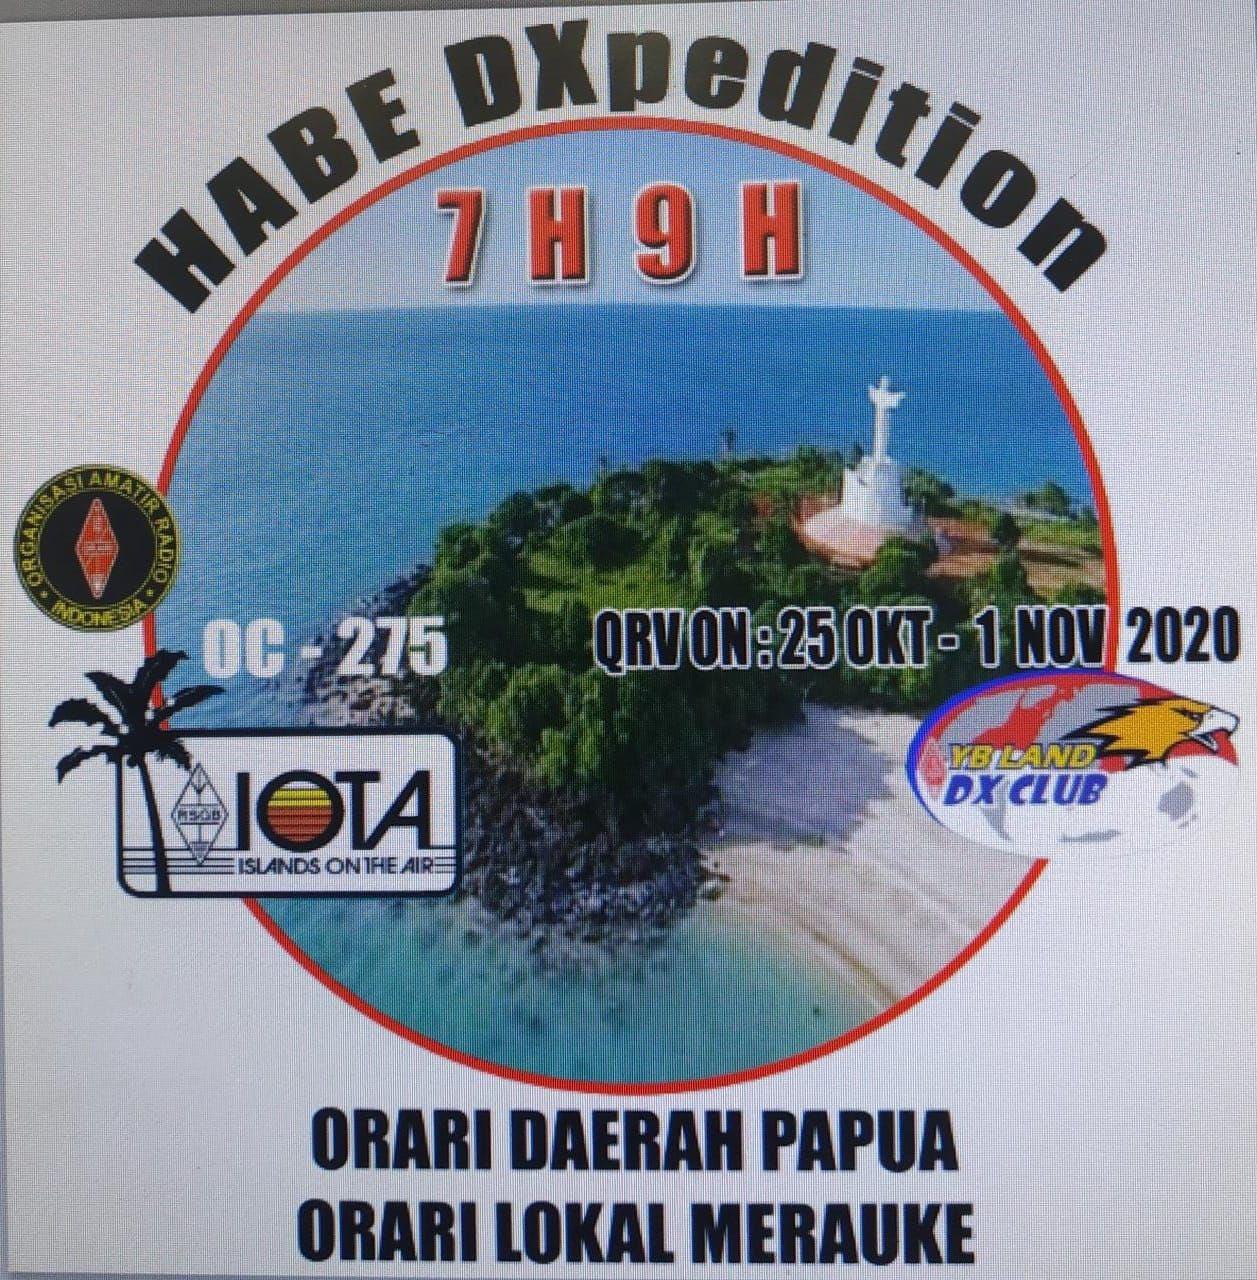 7H9H Habe Island, Indonesia